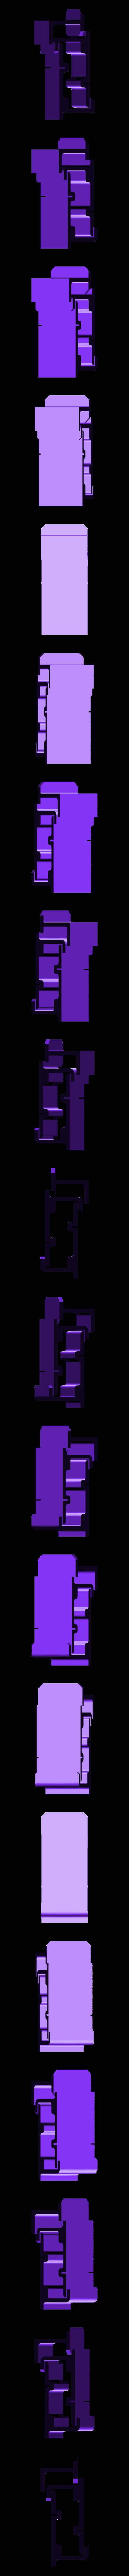 set_20mm.stl Download free STL file FlashForge Adventurer3 Mirror Hook • 3D printing template, CyberCyclist